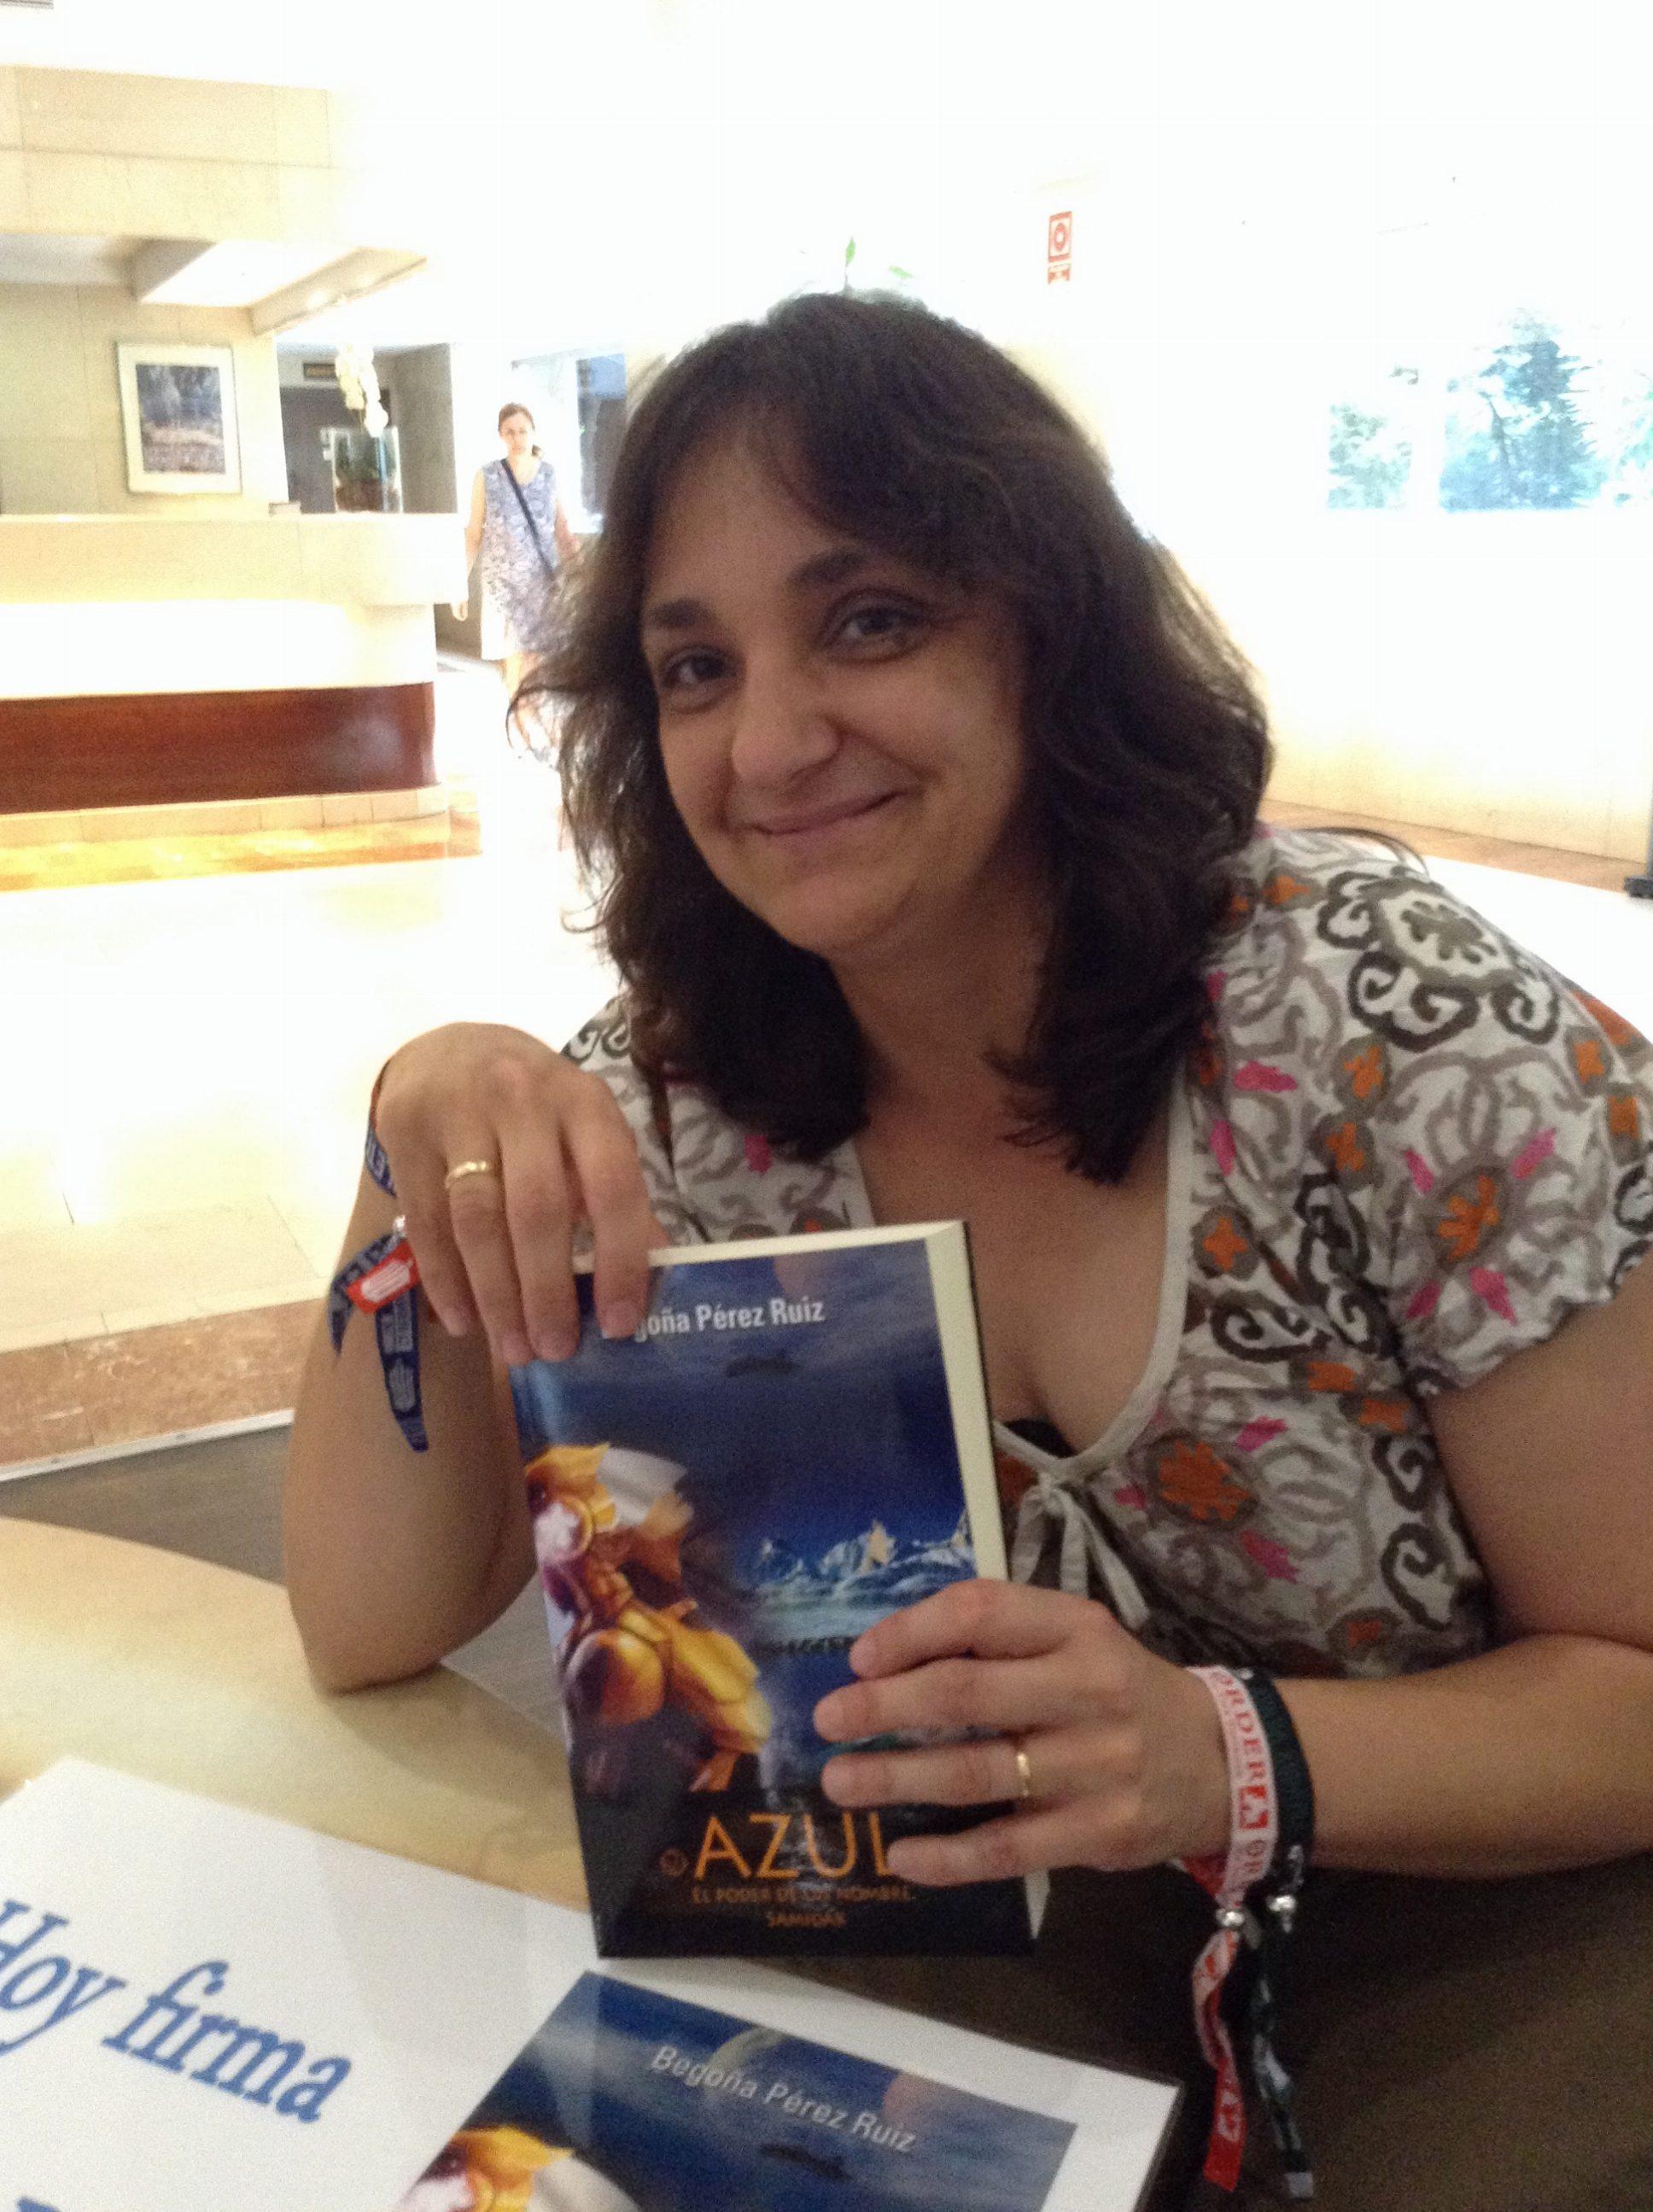 Begoña Pérez Ruiz, autora de Azul